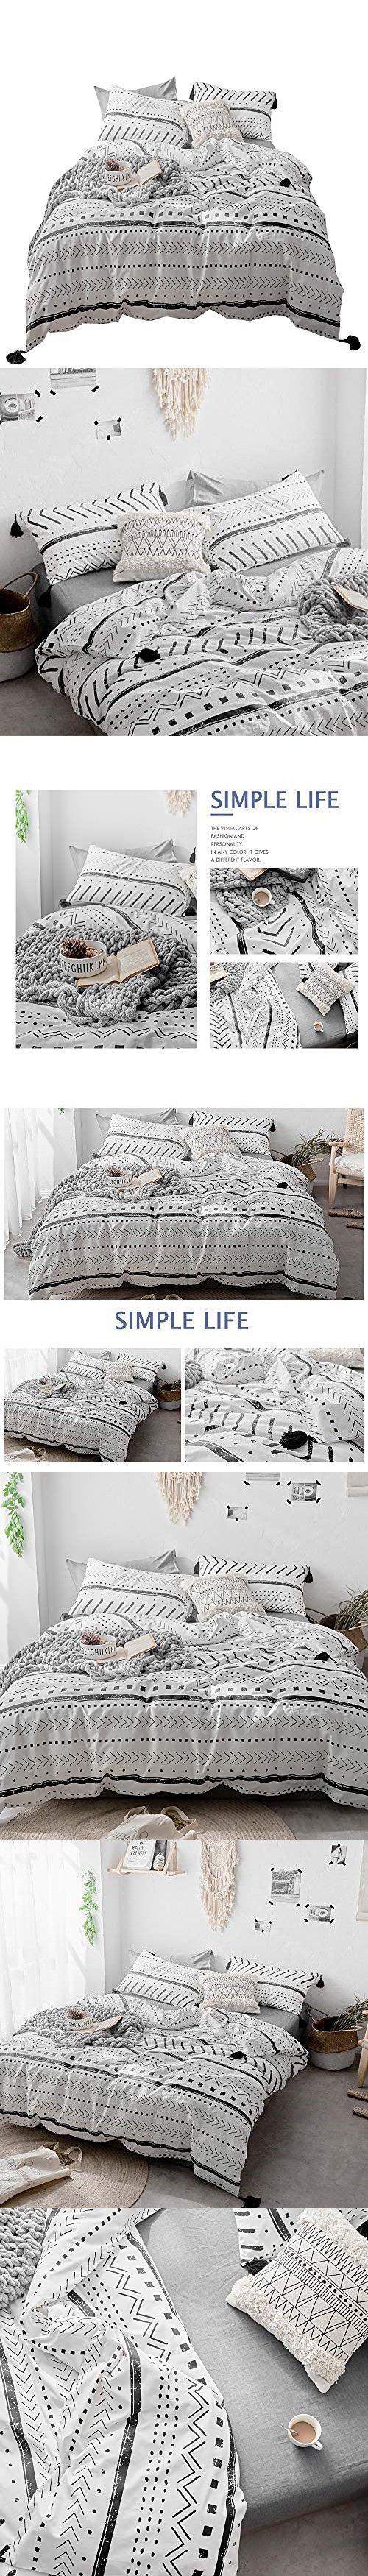 Best Vclife Cotton Twin Bedding Sets Modern Kids Duvet Cover 400 x 300